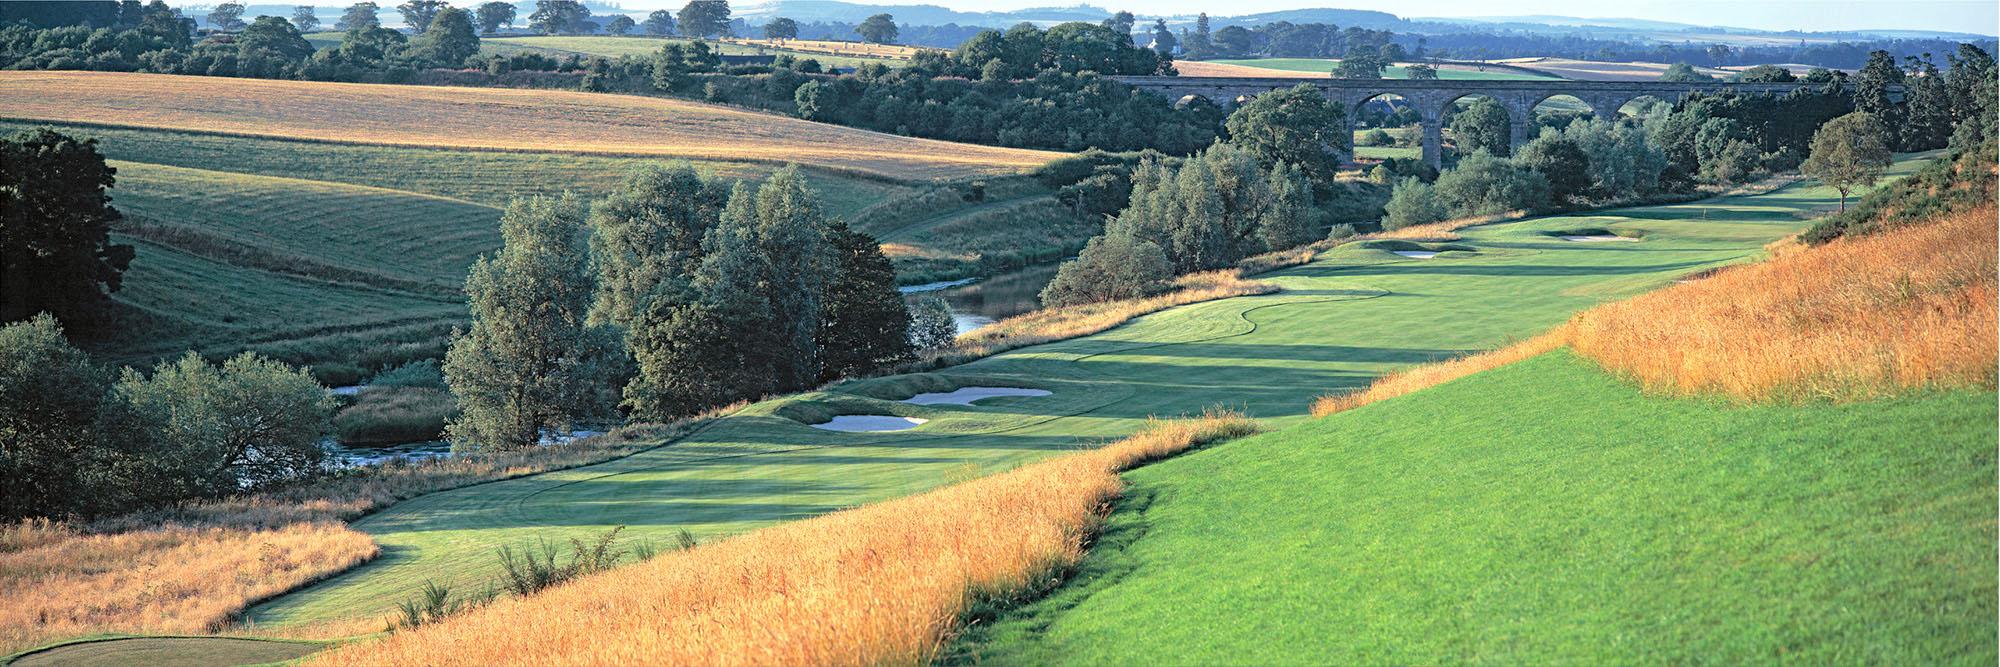 Golf Course Image - Roxburghe No. 14